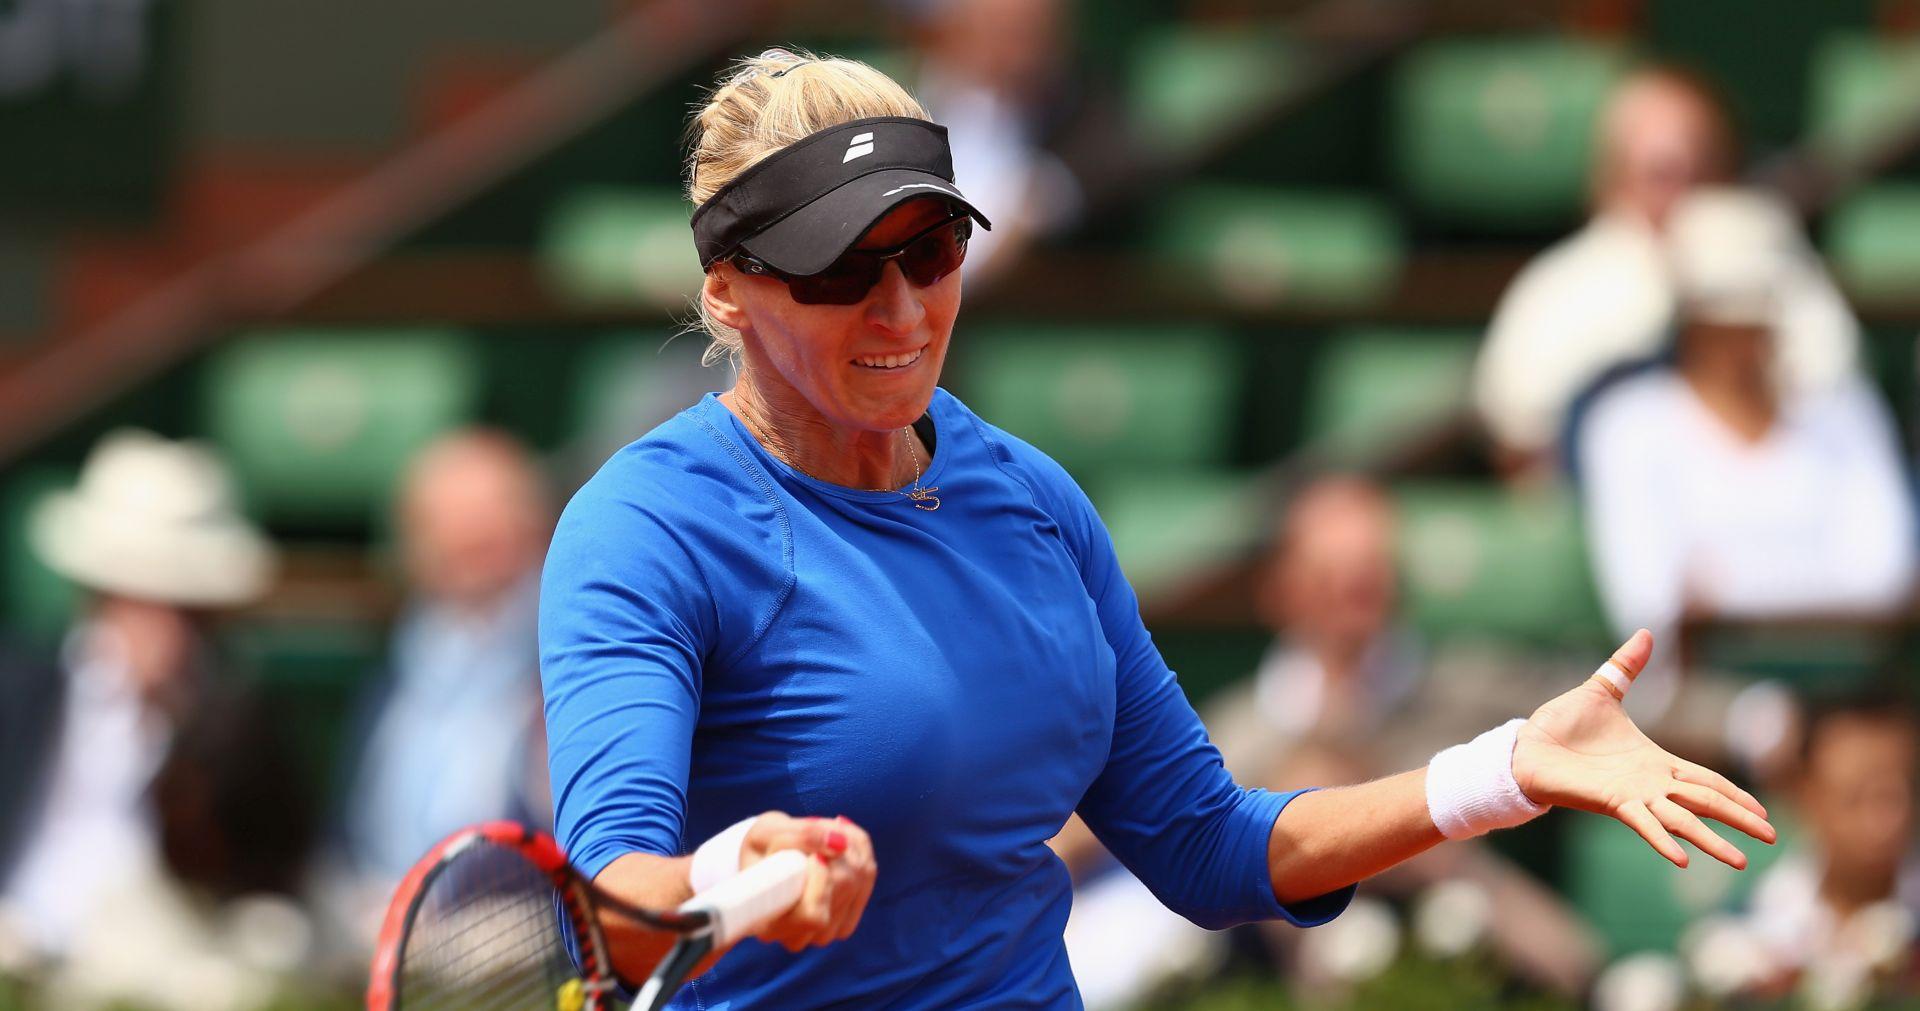 WTA CINCINNATI 'Lucky loser' Lučić Baroni poražena u drugom kolu